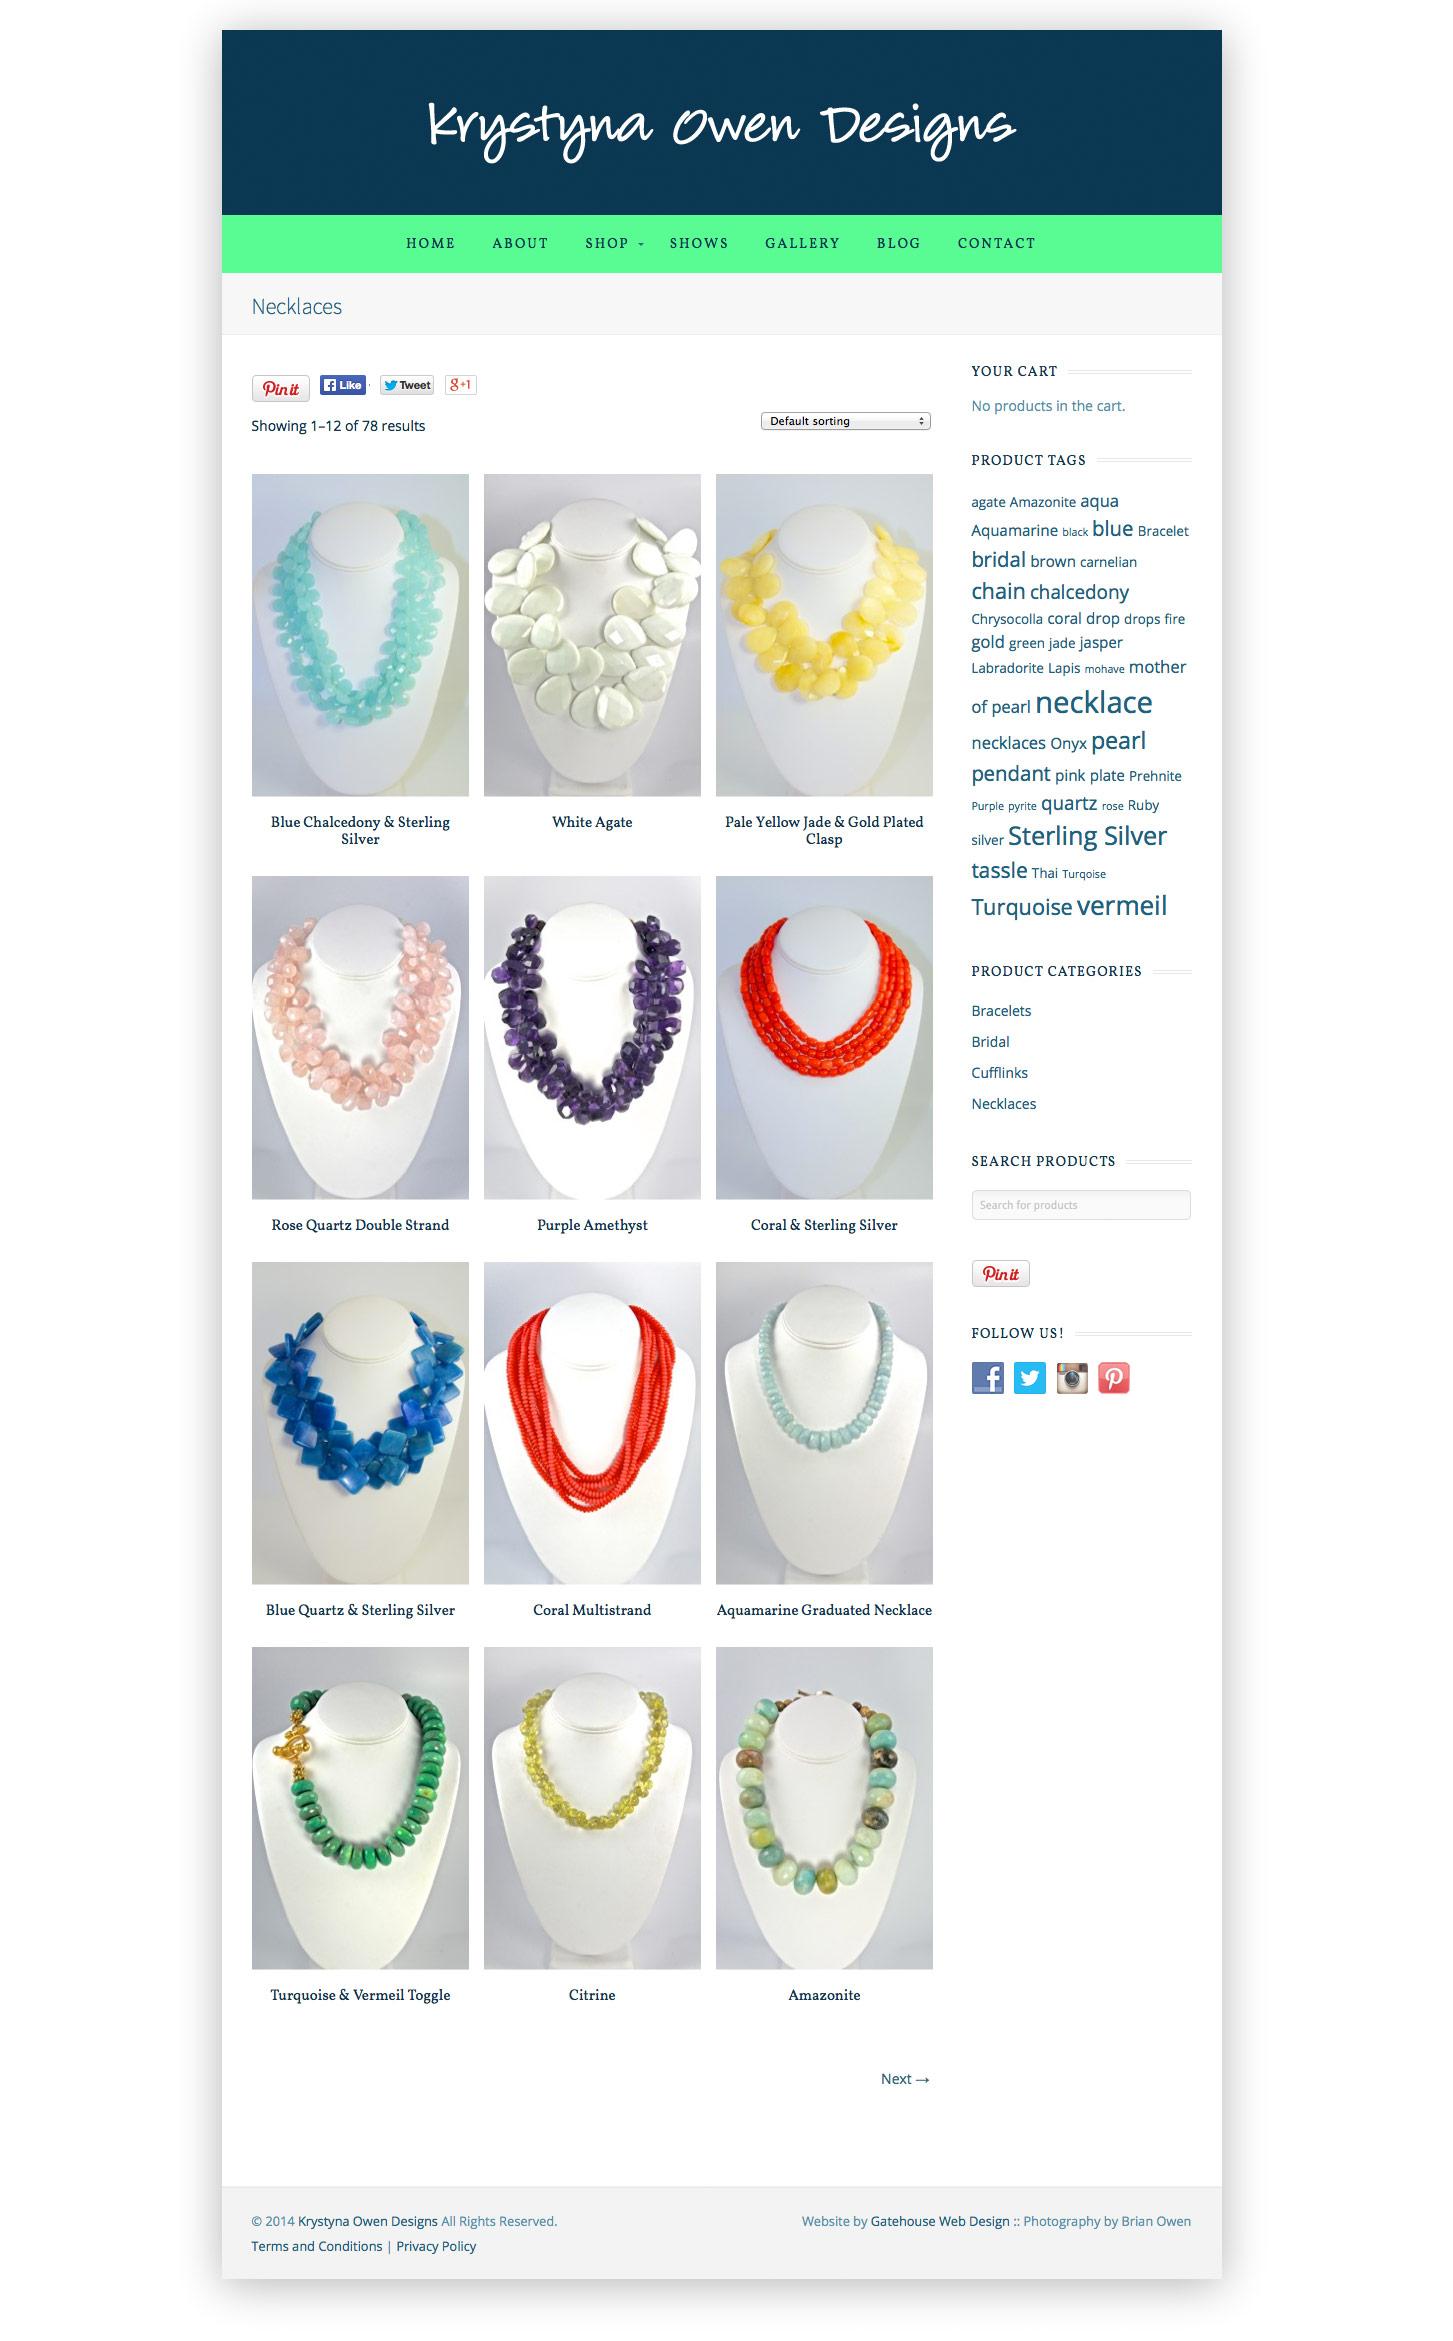 Gatehouse web design custom web site design development for Design and development consultants